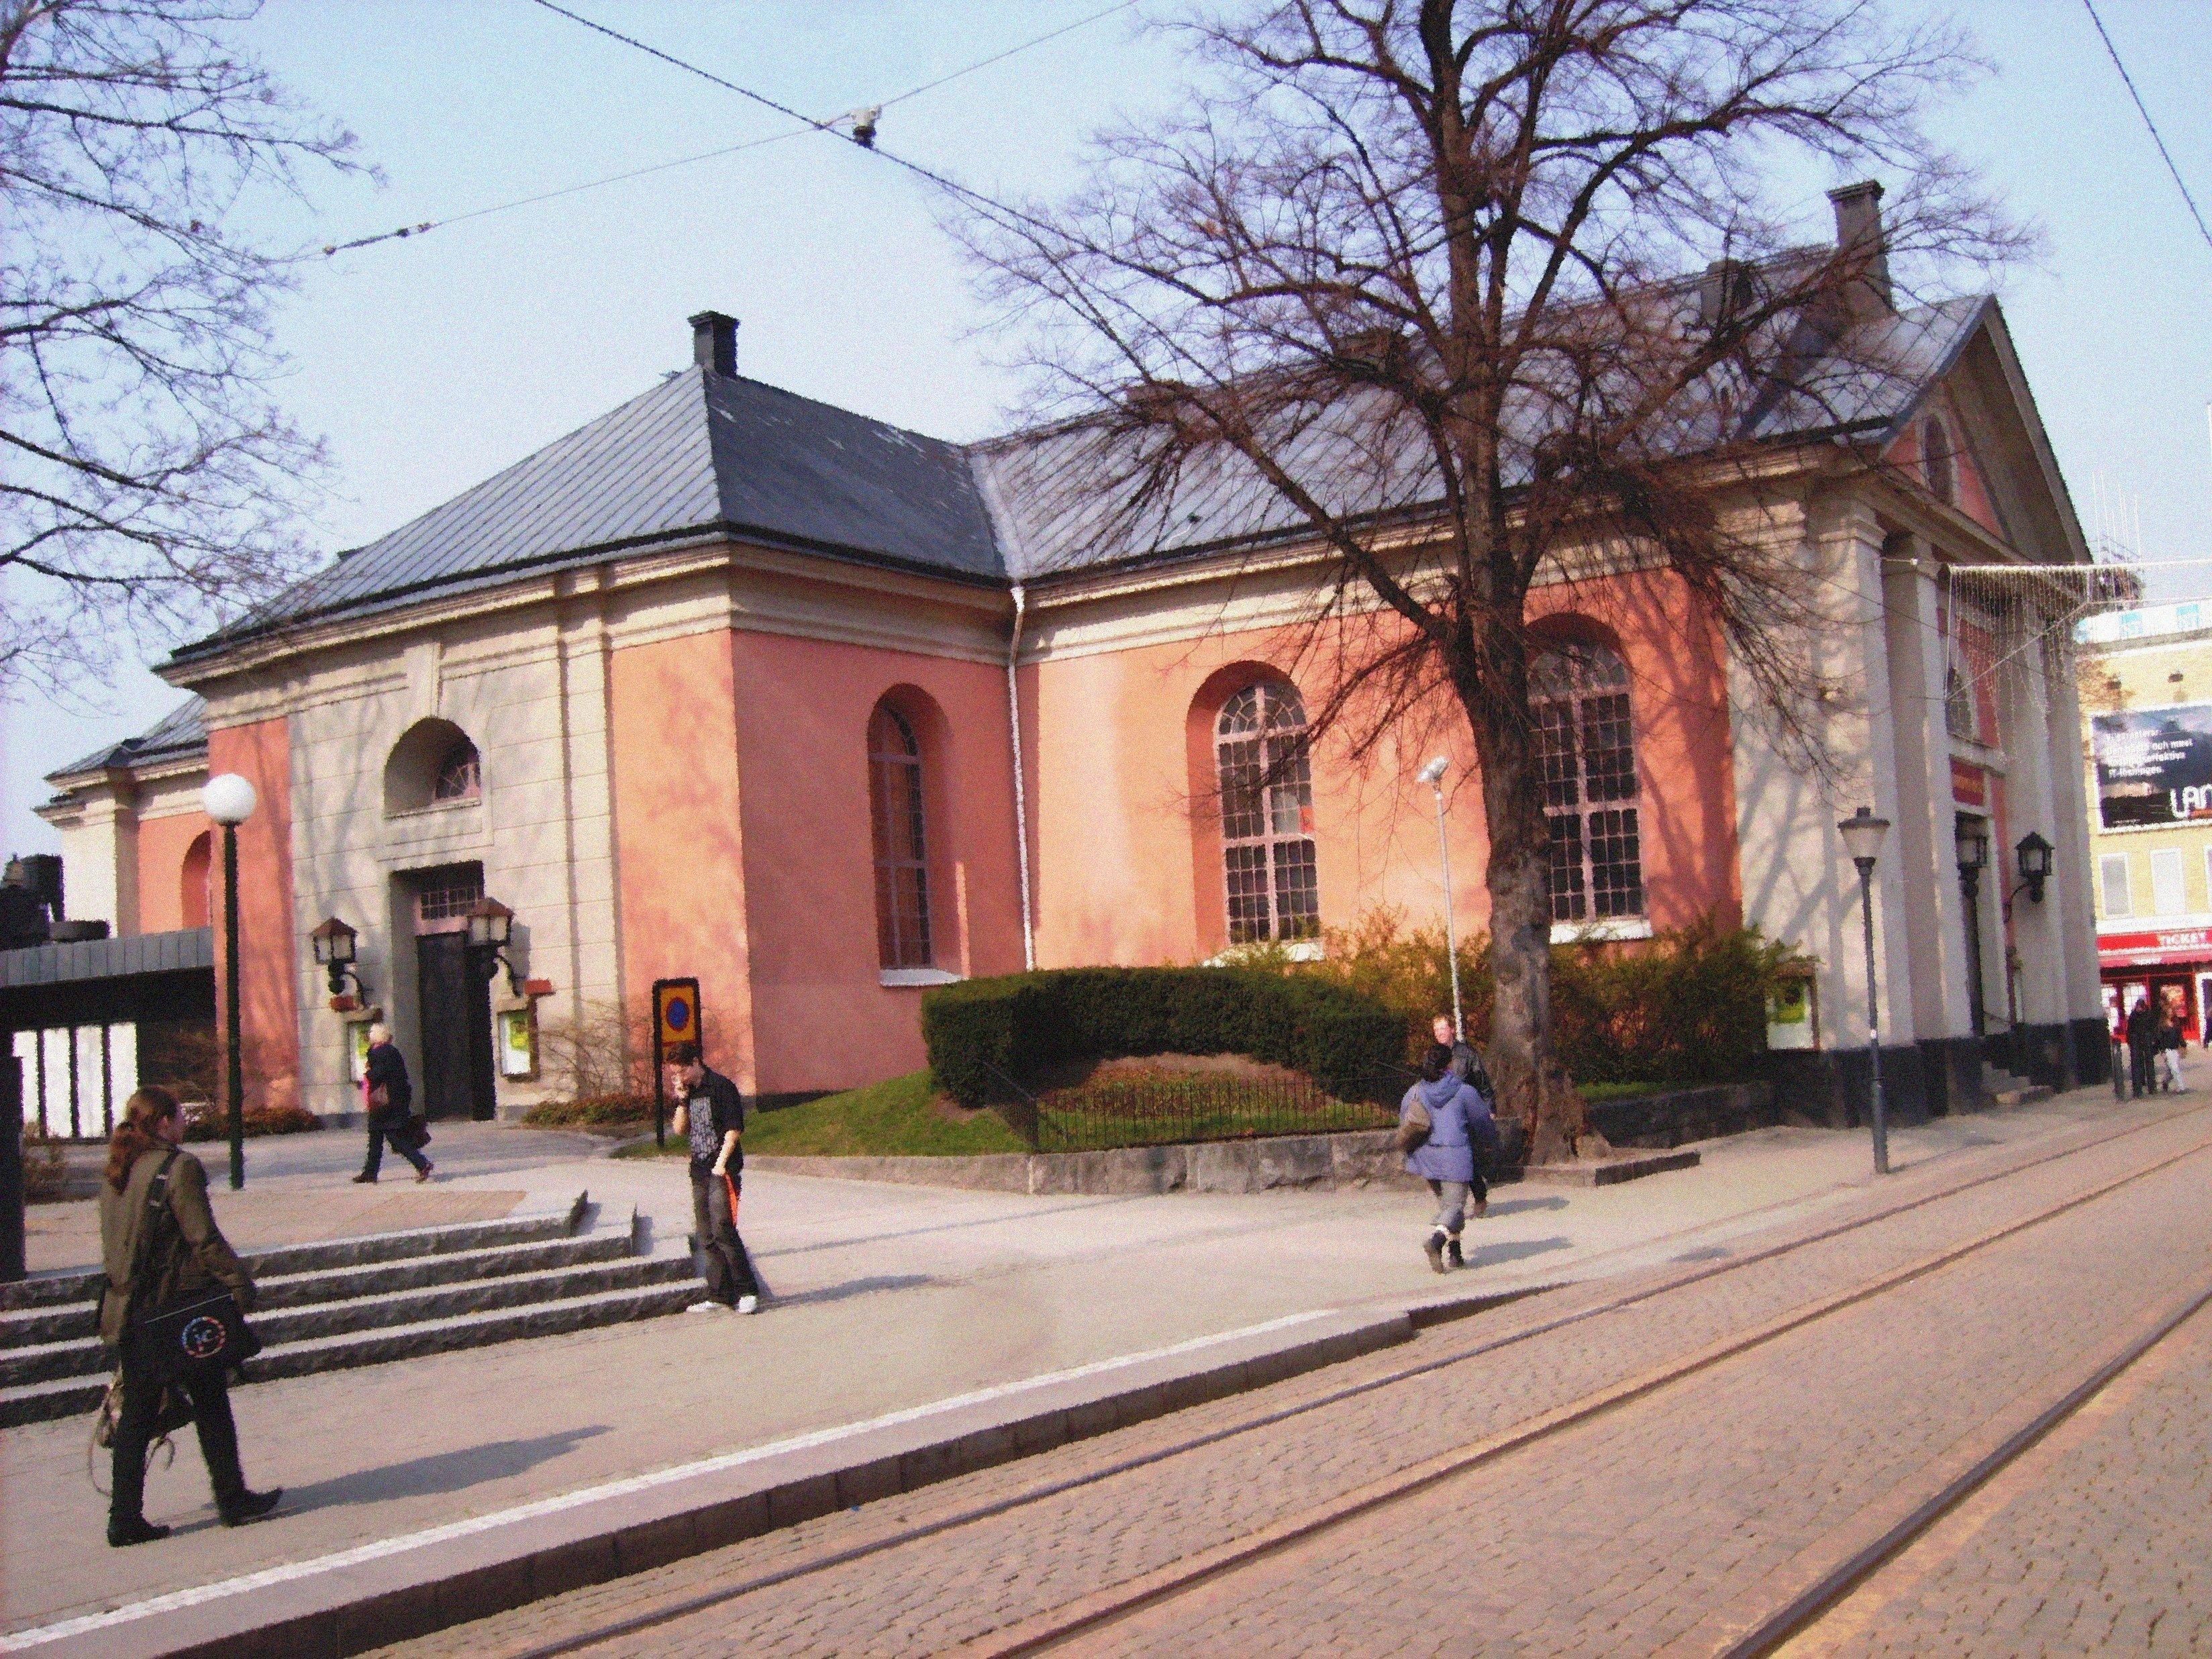 Fil:Sankt Johannes gamla kyrka (Hrsalen) i Norrkping, den